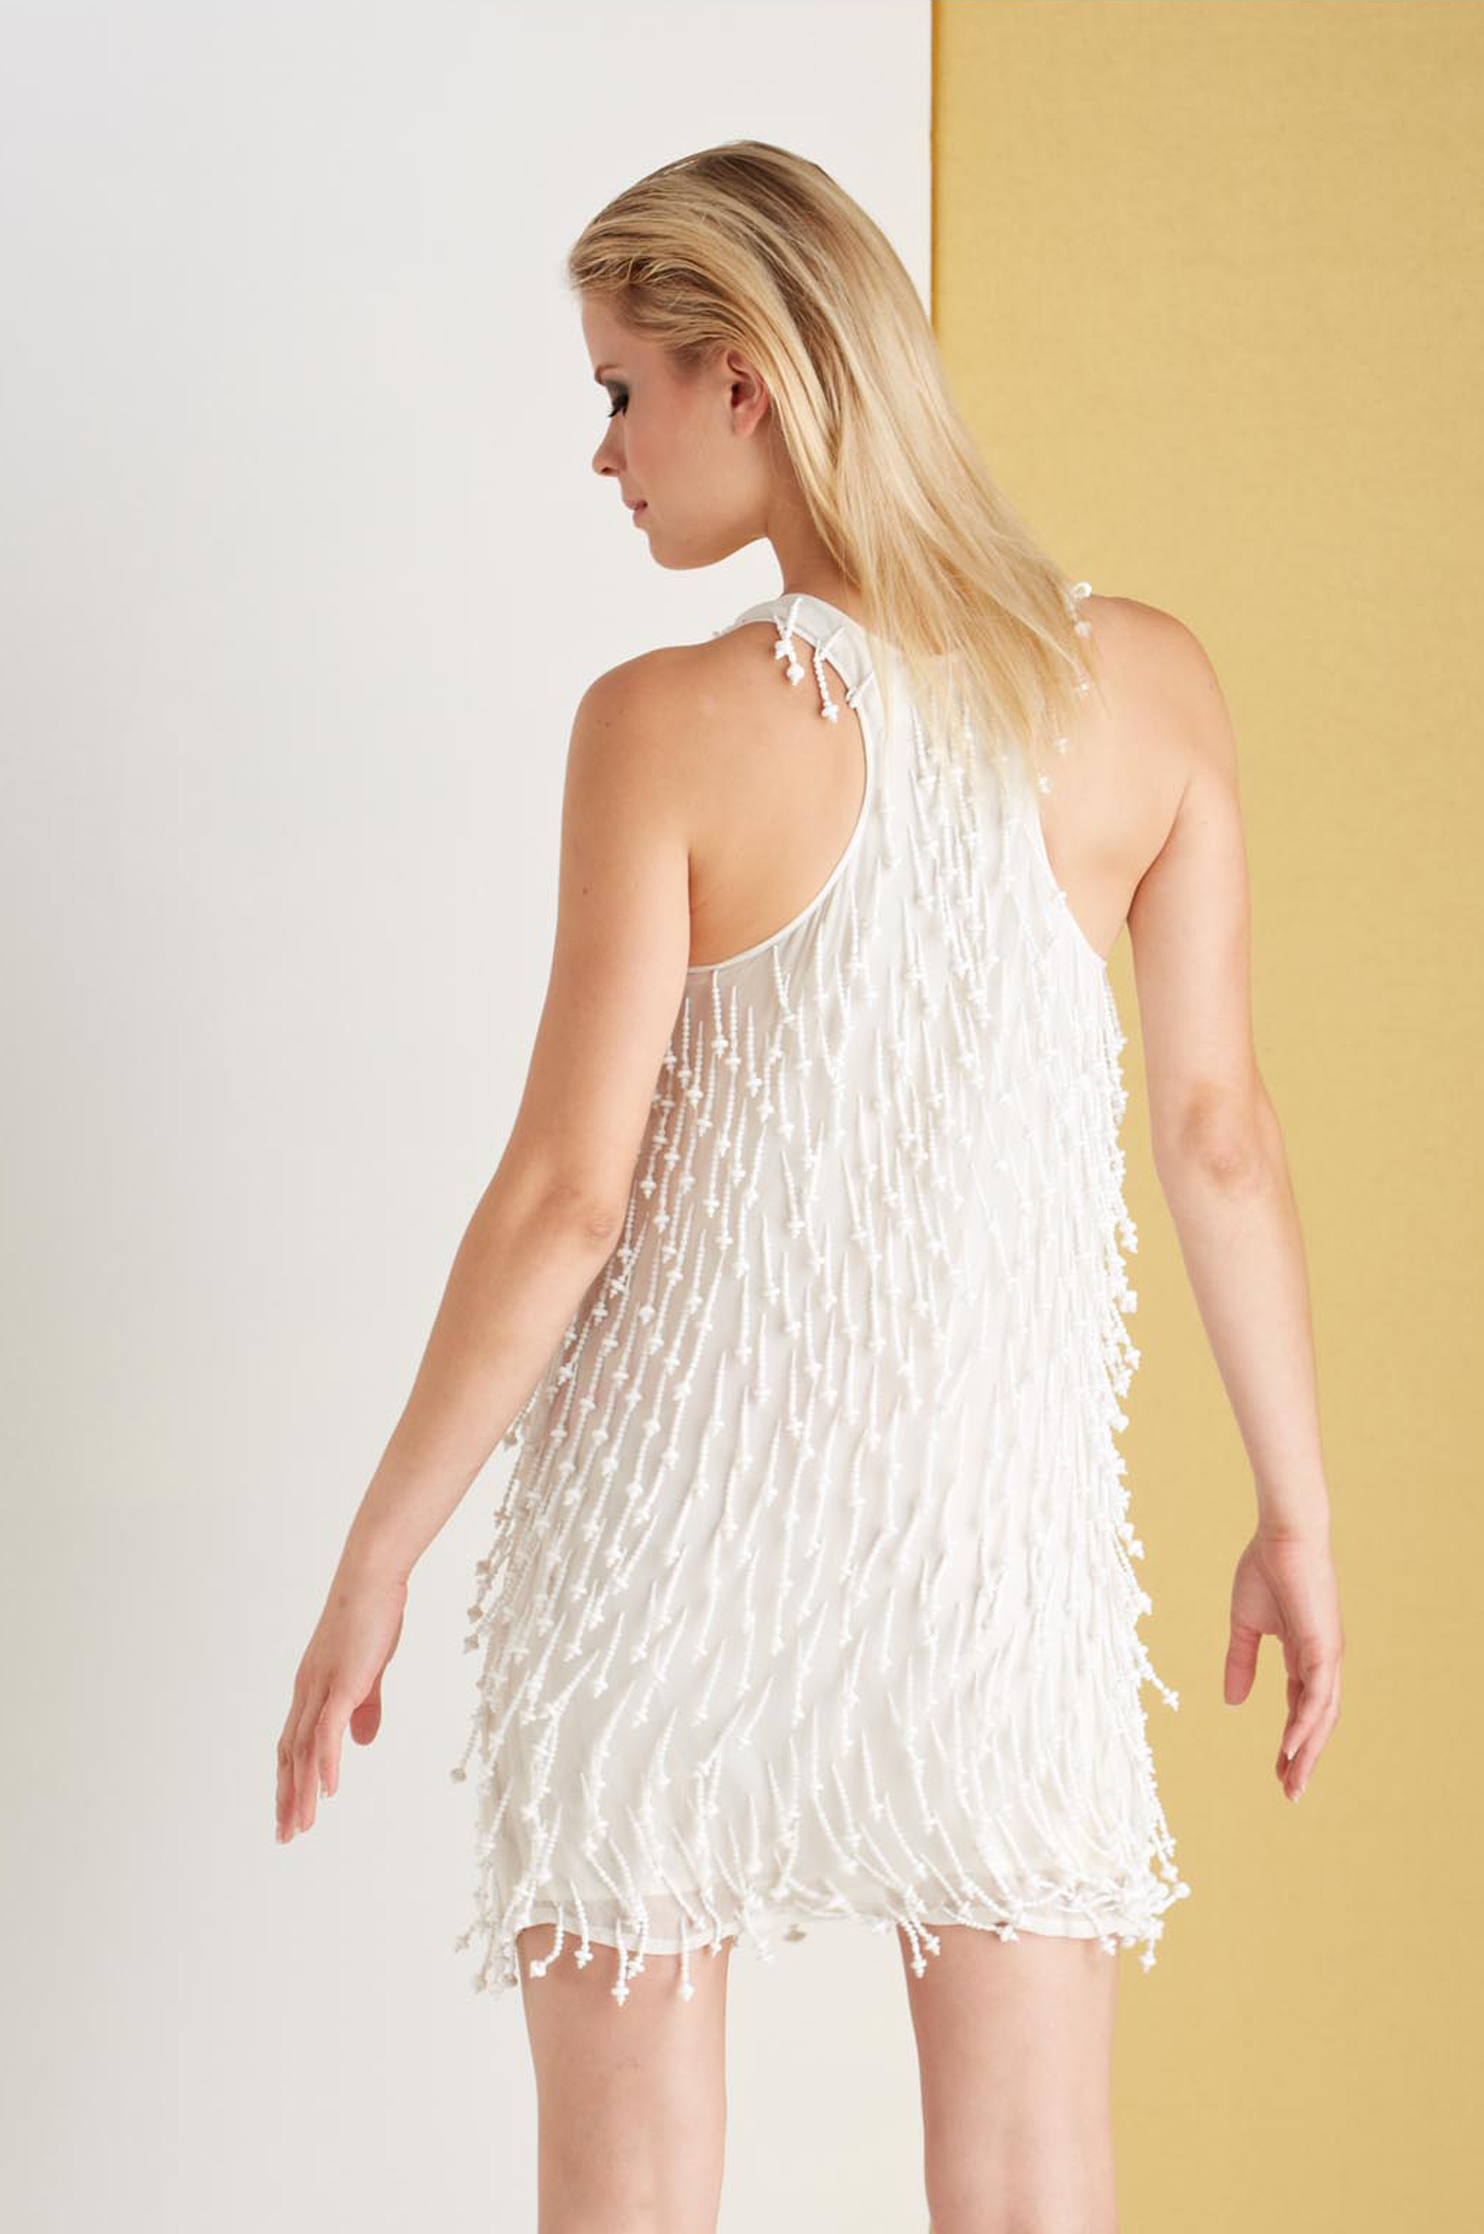 dress_ELISA_02 - Copy